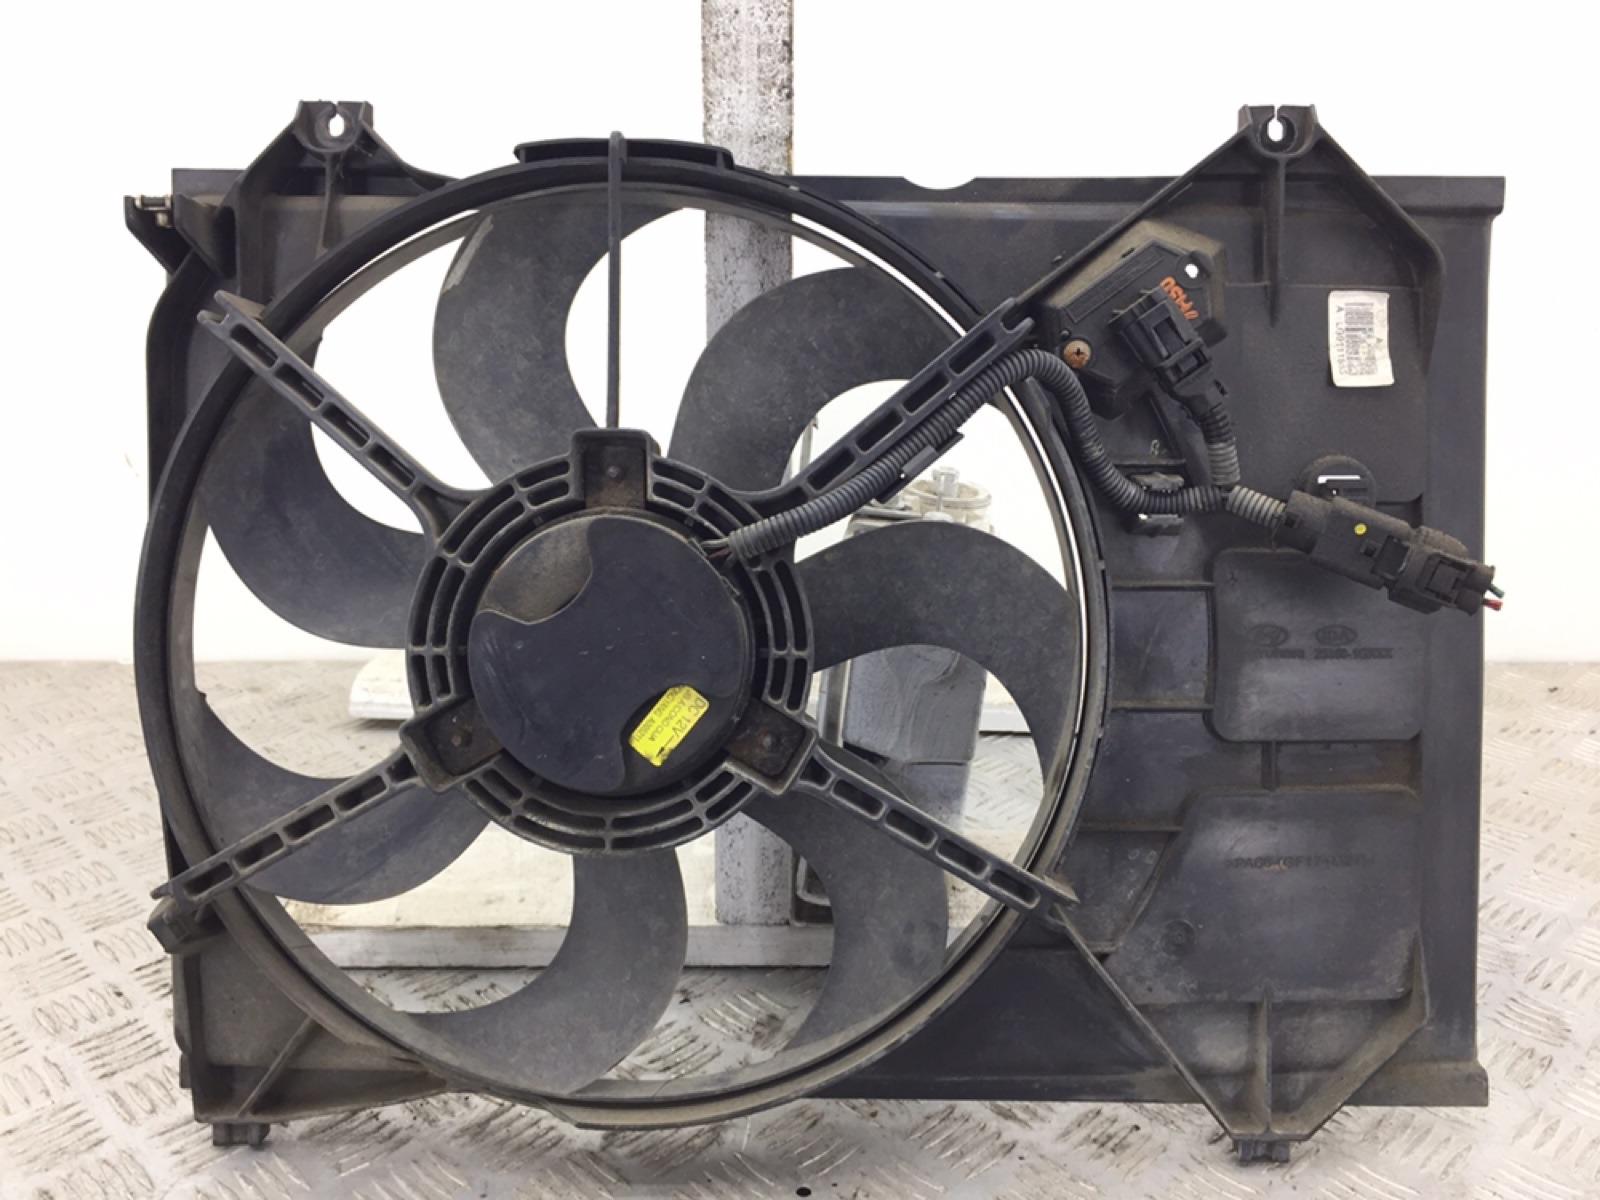 Вентилятор радиатора Kia Rio 1.5 CRDI 2008 (б/у)